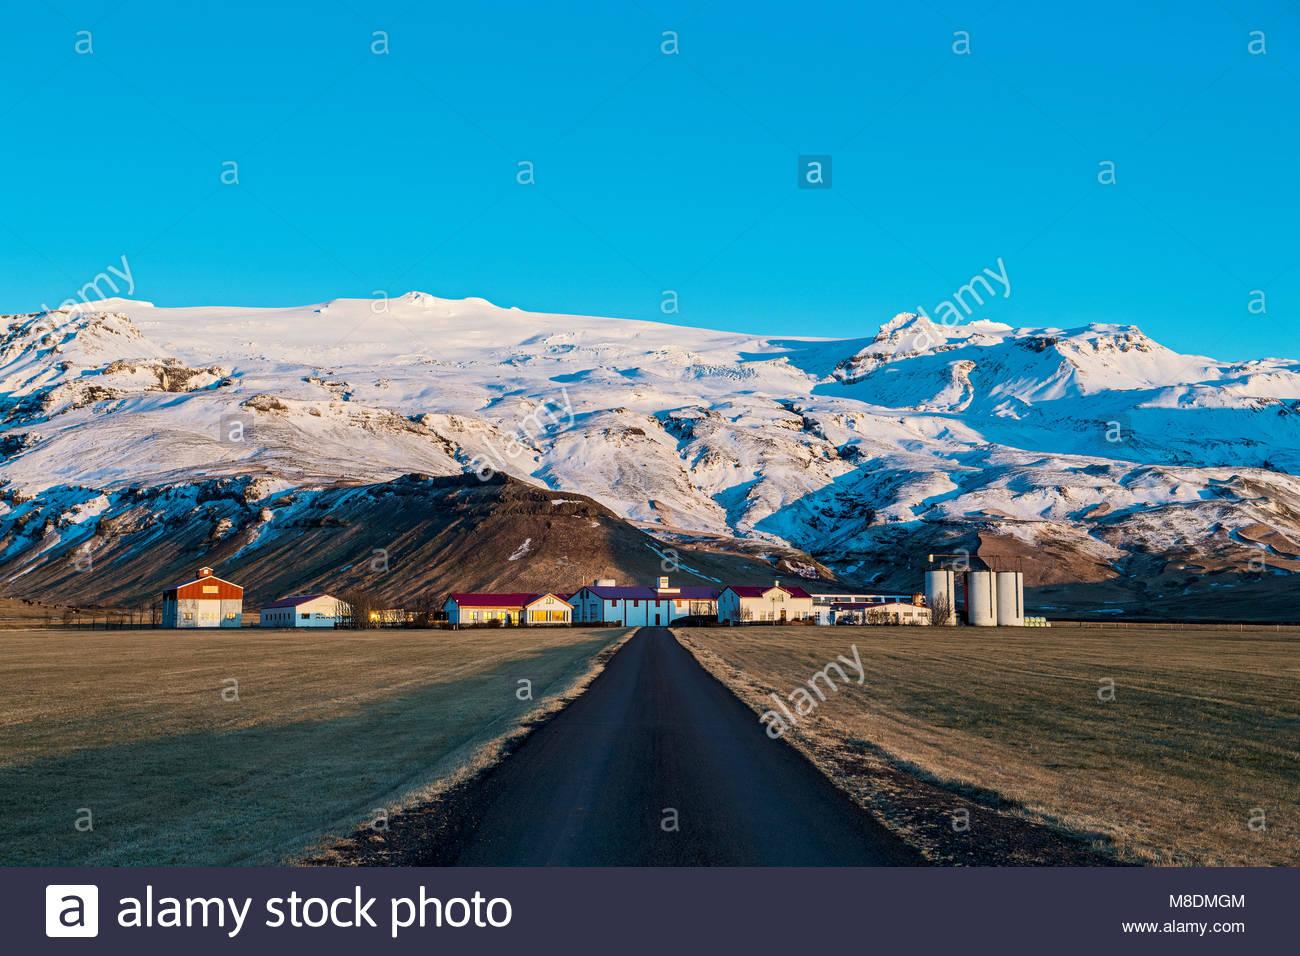 Dorf unten Eyjafjallajokull Gletscher, Vulkan, Island, Europa Stockbild